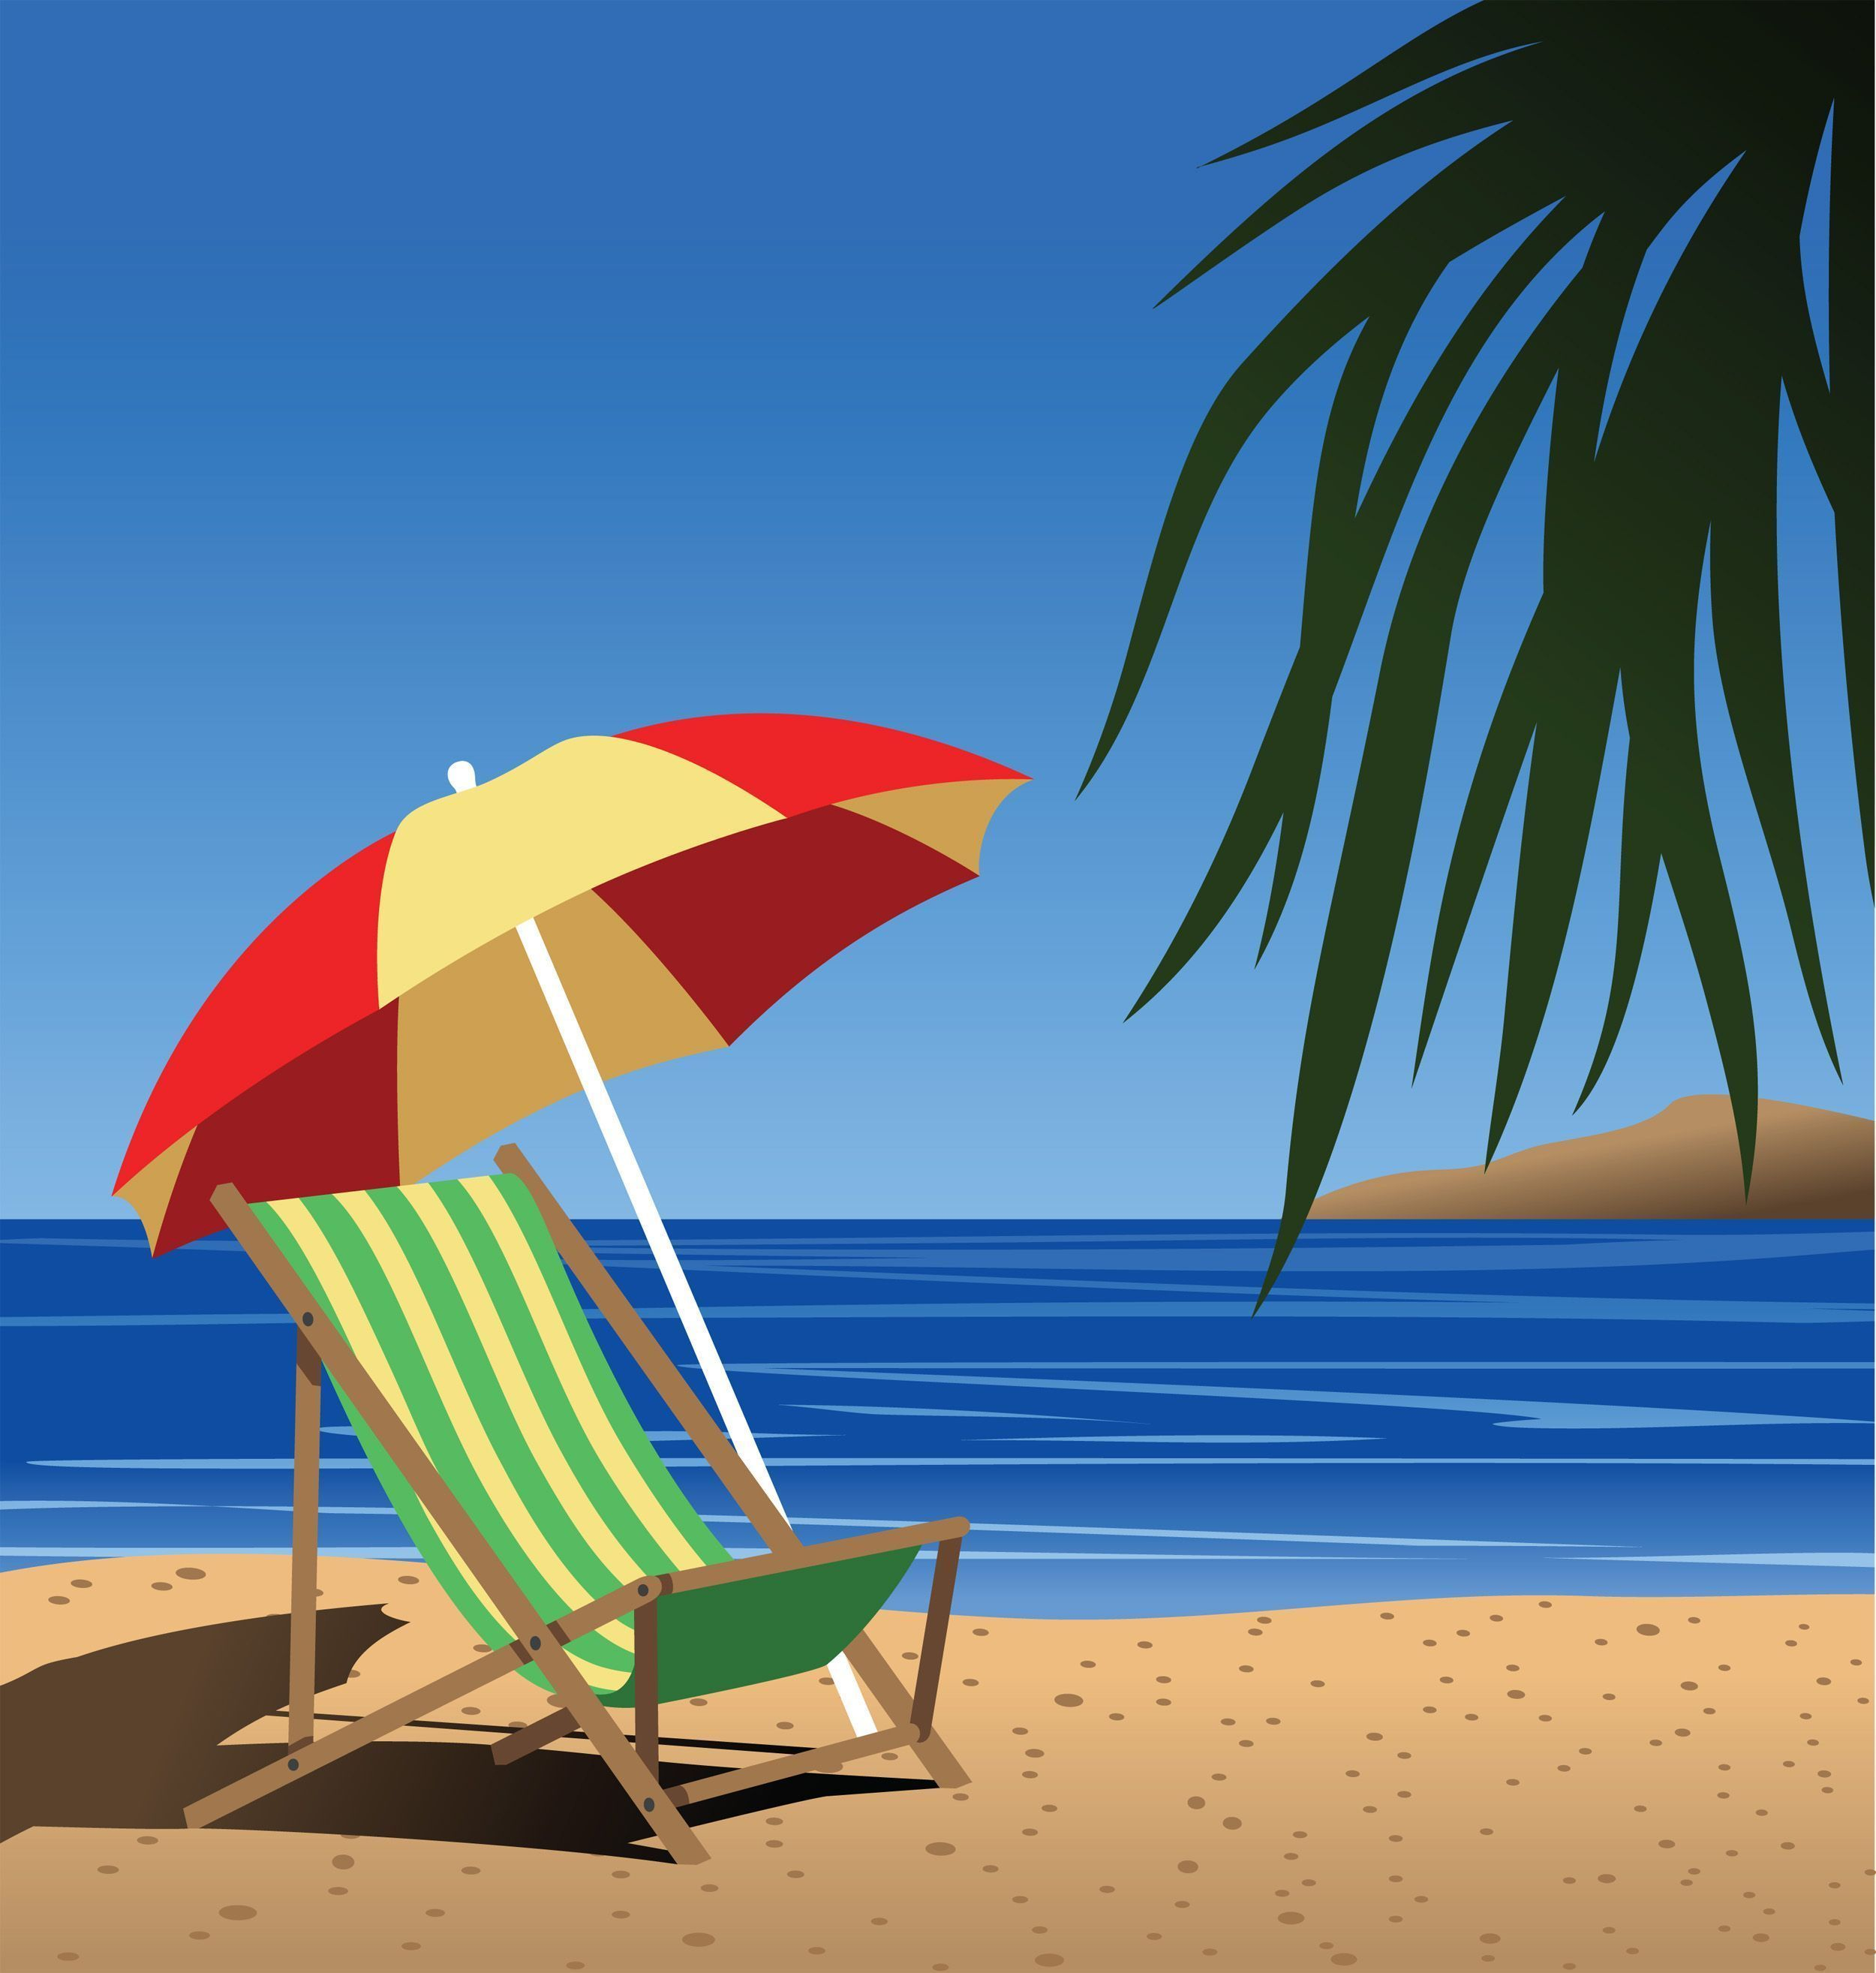 arrieres plans backgrounds paysages page 3 beach scene clip art borders beach scene clipare images